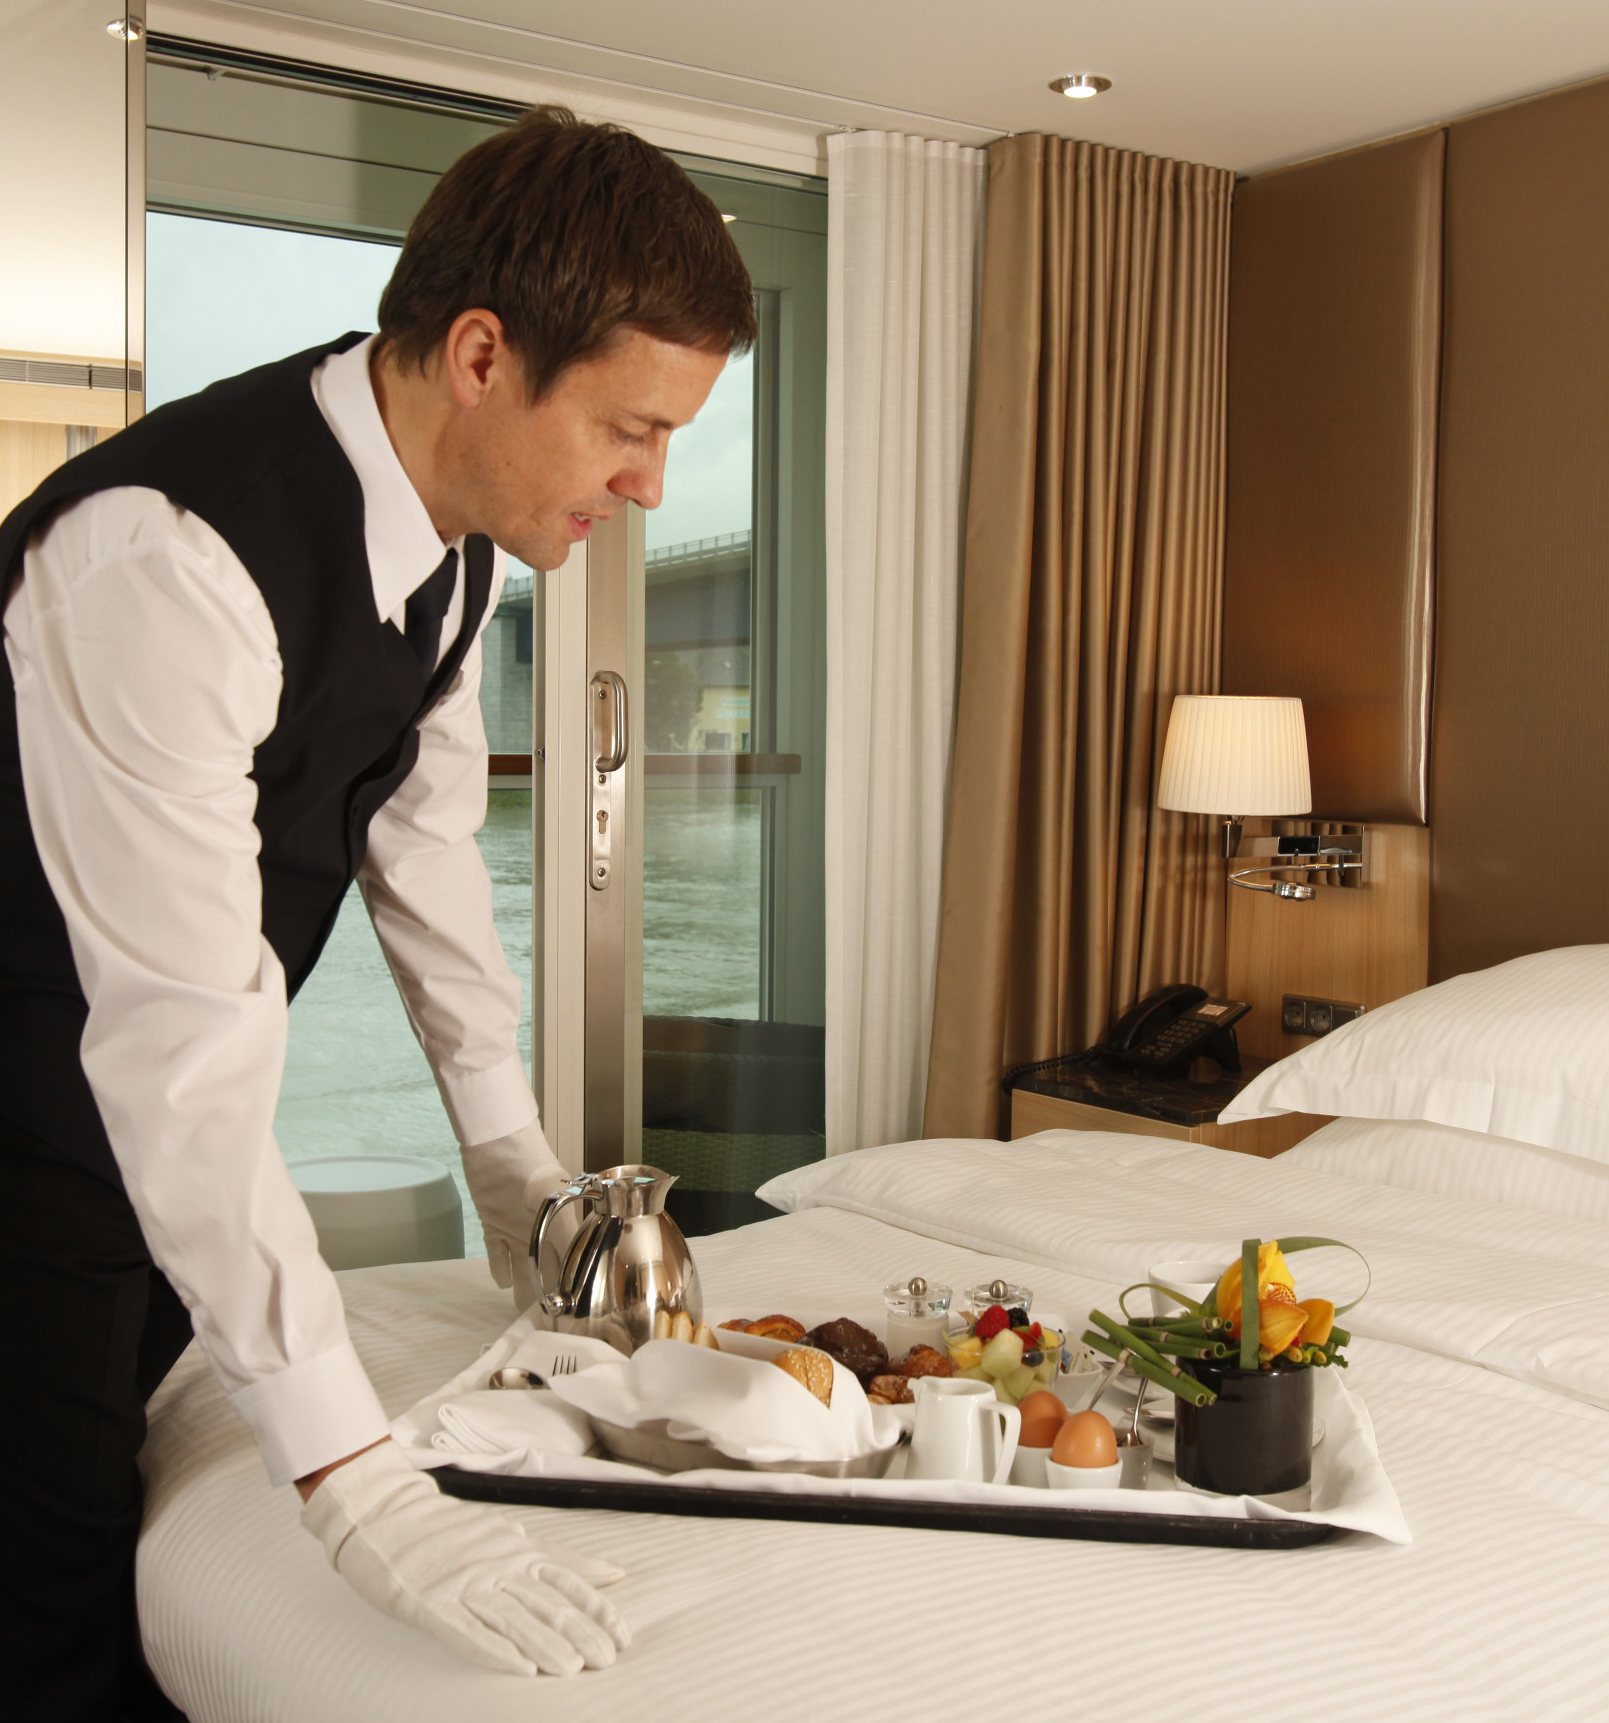 Scenic Jasper Room Service Dining _MG_9731.jpg